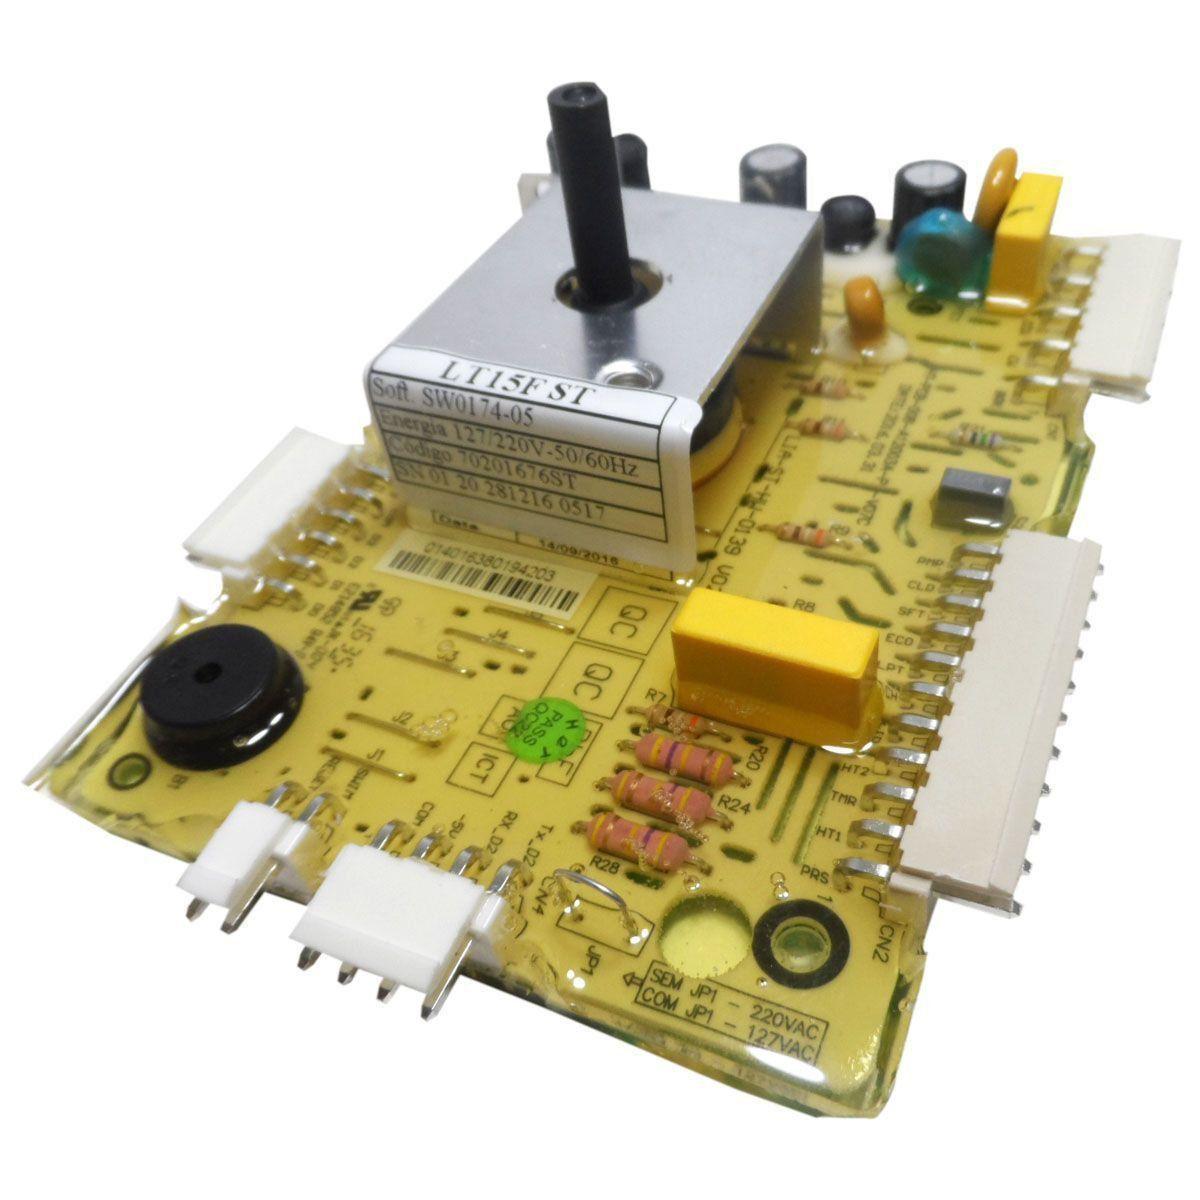 Placa Eletrônica Potência Lavadora Electrolux Bivolt 70201676